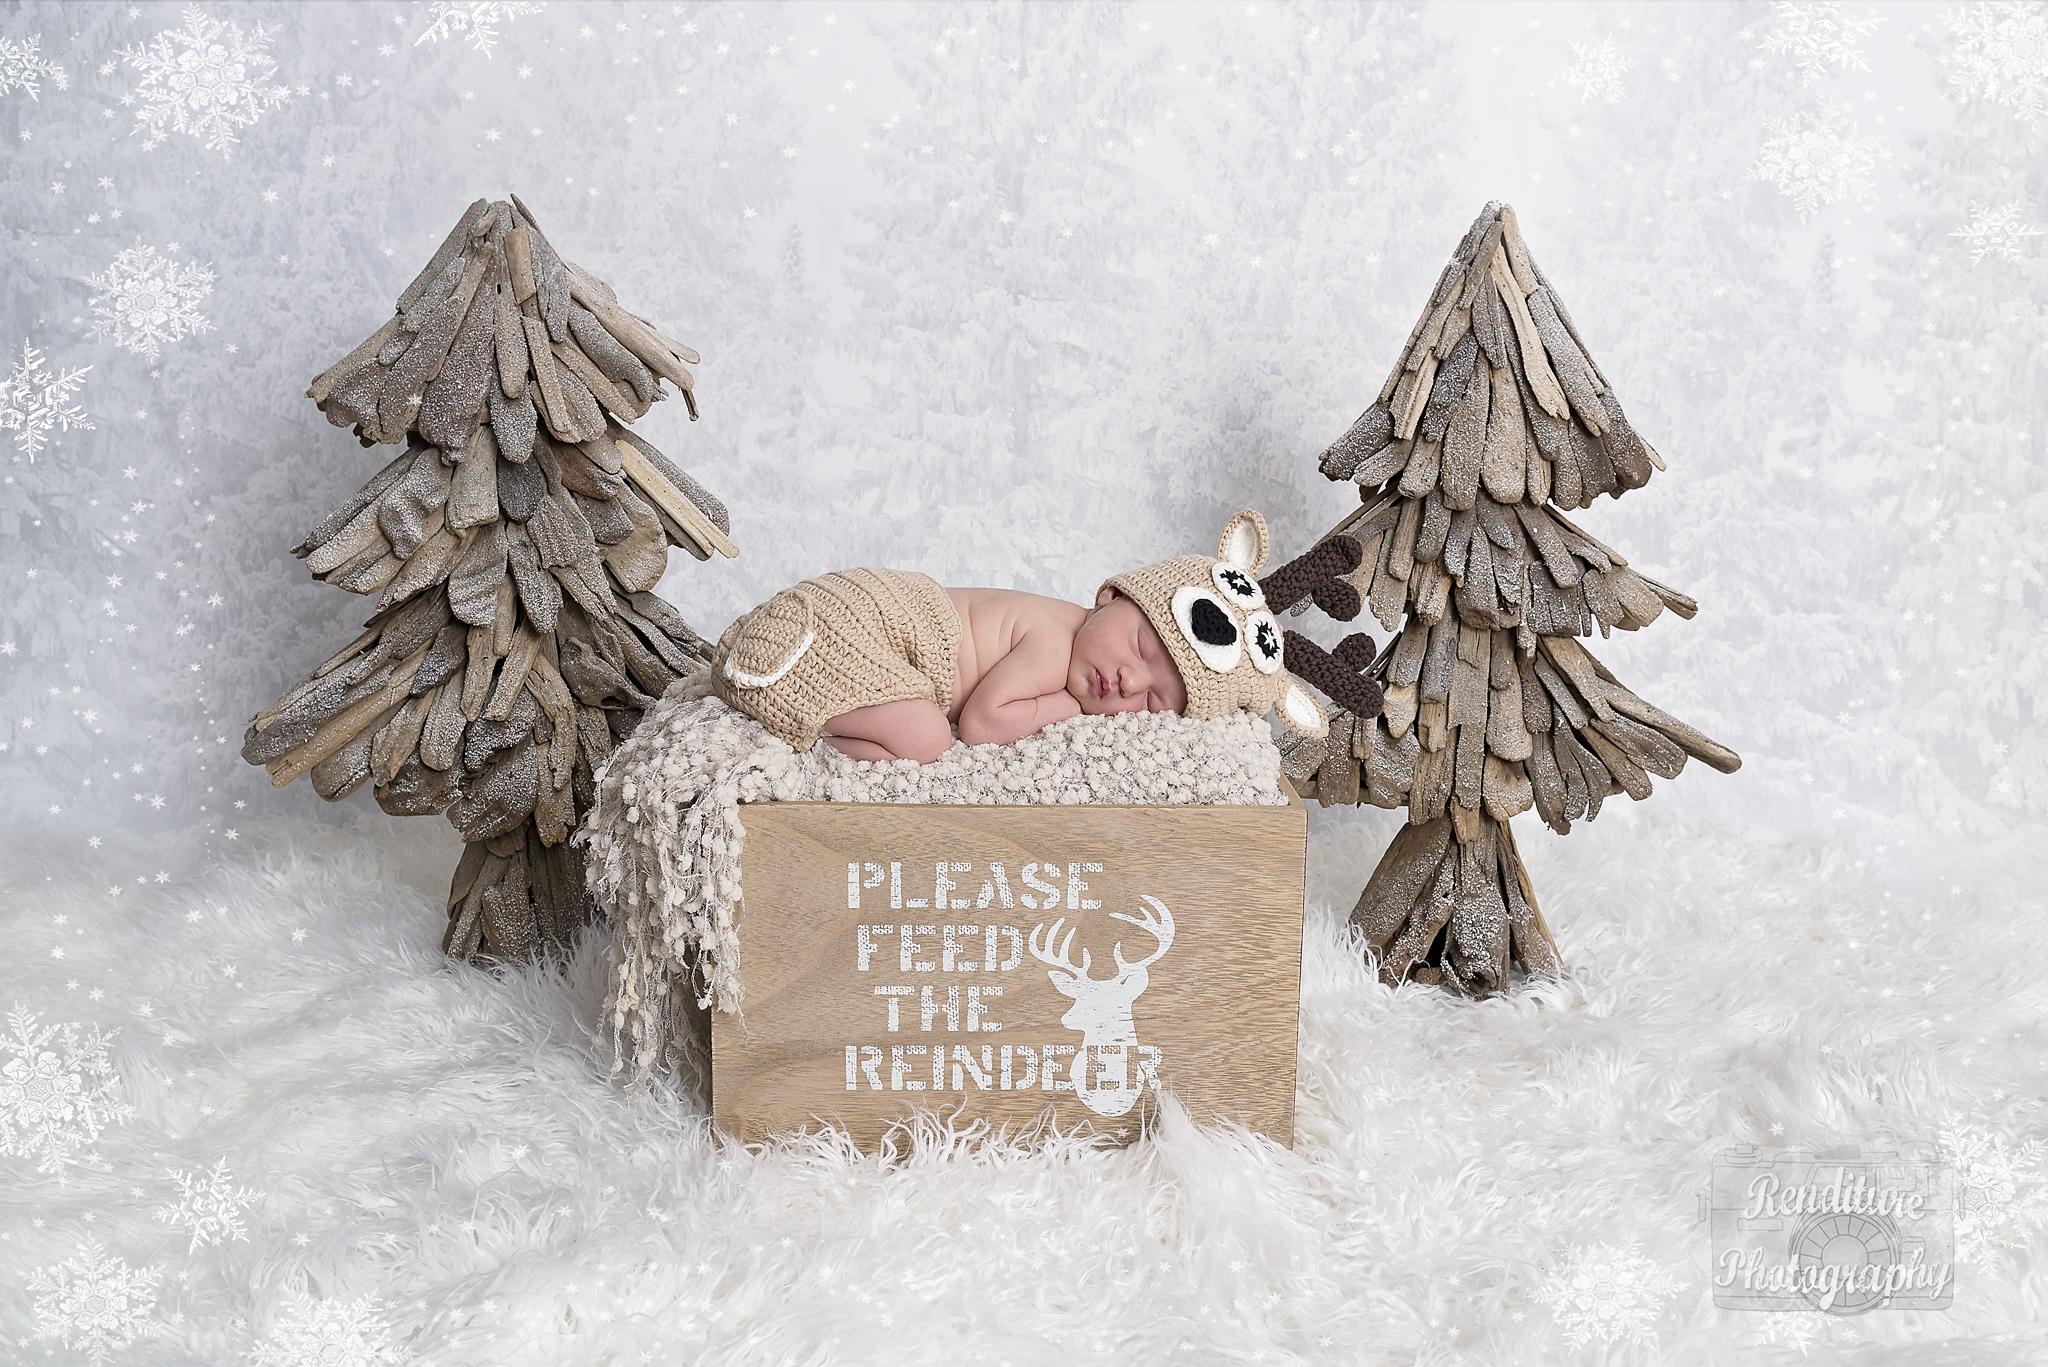 Saskatoon-Newborn-Family-Renditure-Mini-Session-Photography-Photographer-Christmas-Holiday-Saskatchewan-470 FBR.jpg